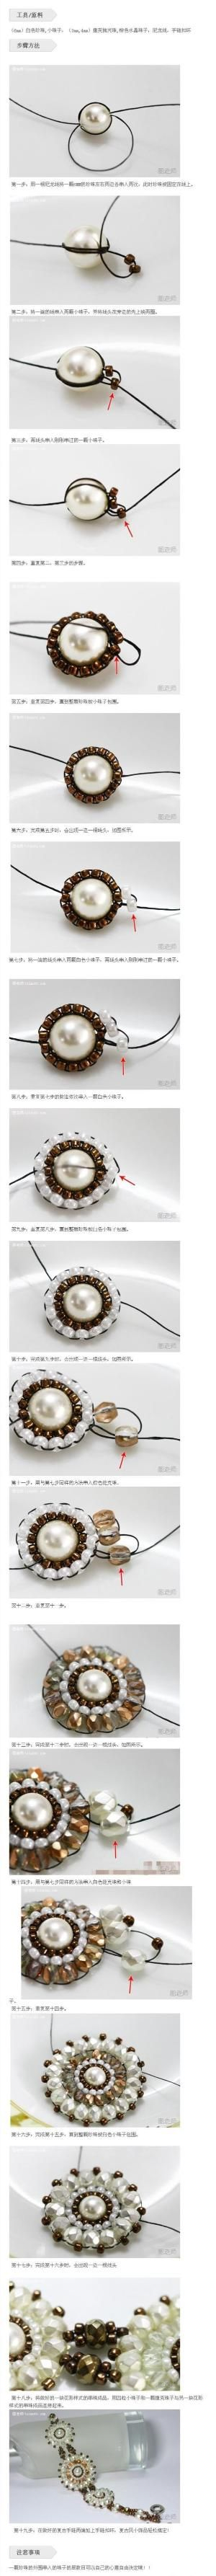 Tutorial for a Retro beaded bracelet by boo12600